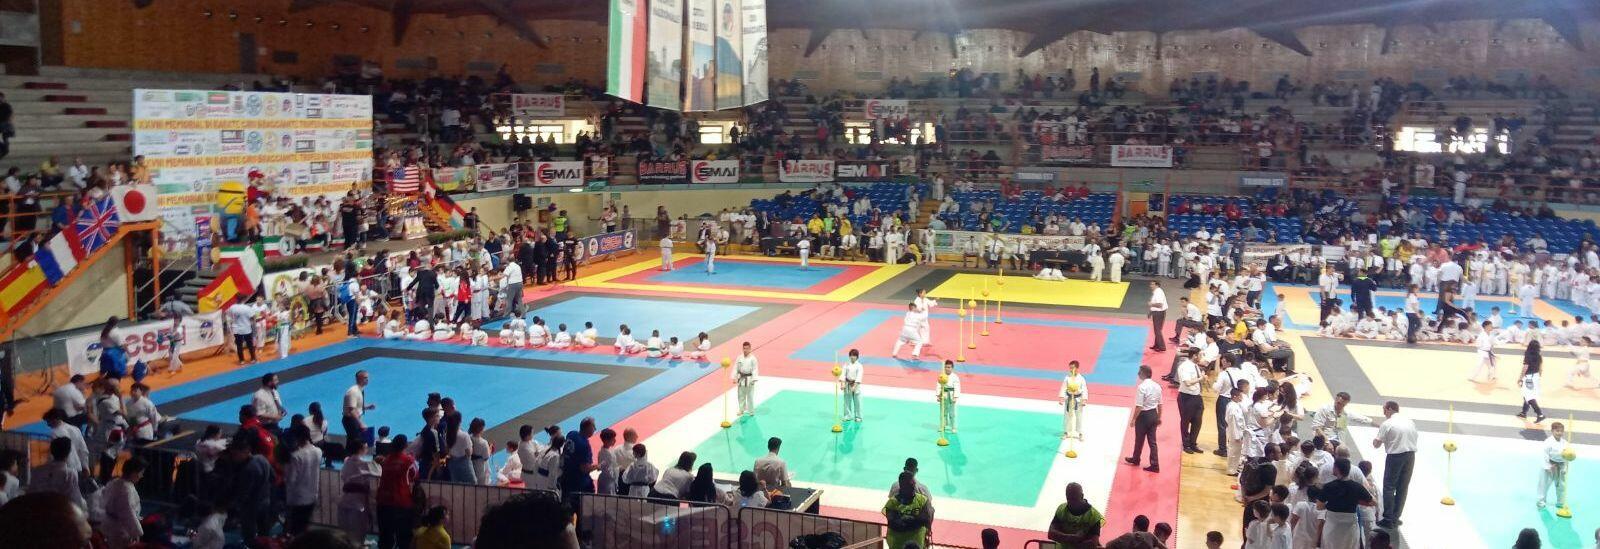 Altri riconoscimenti per il karateka gioiosano Simone Femia